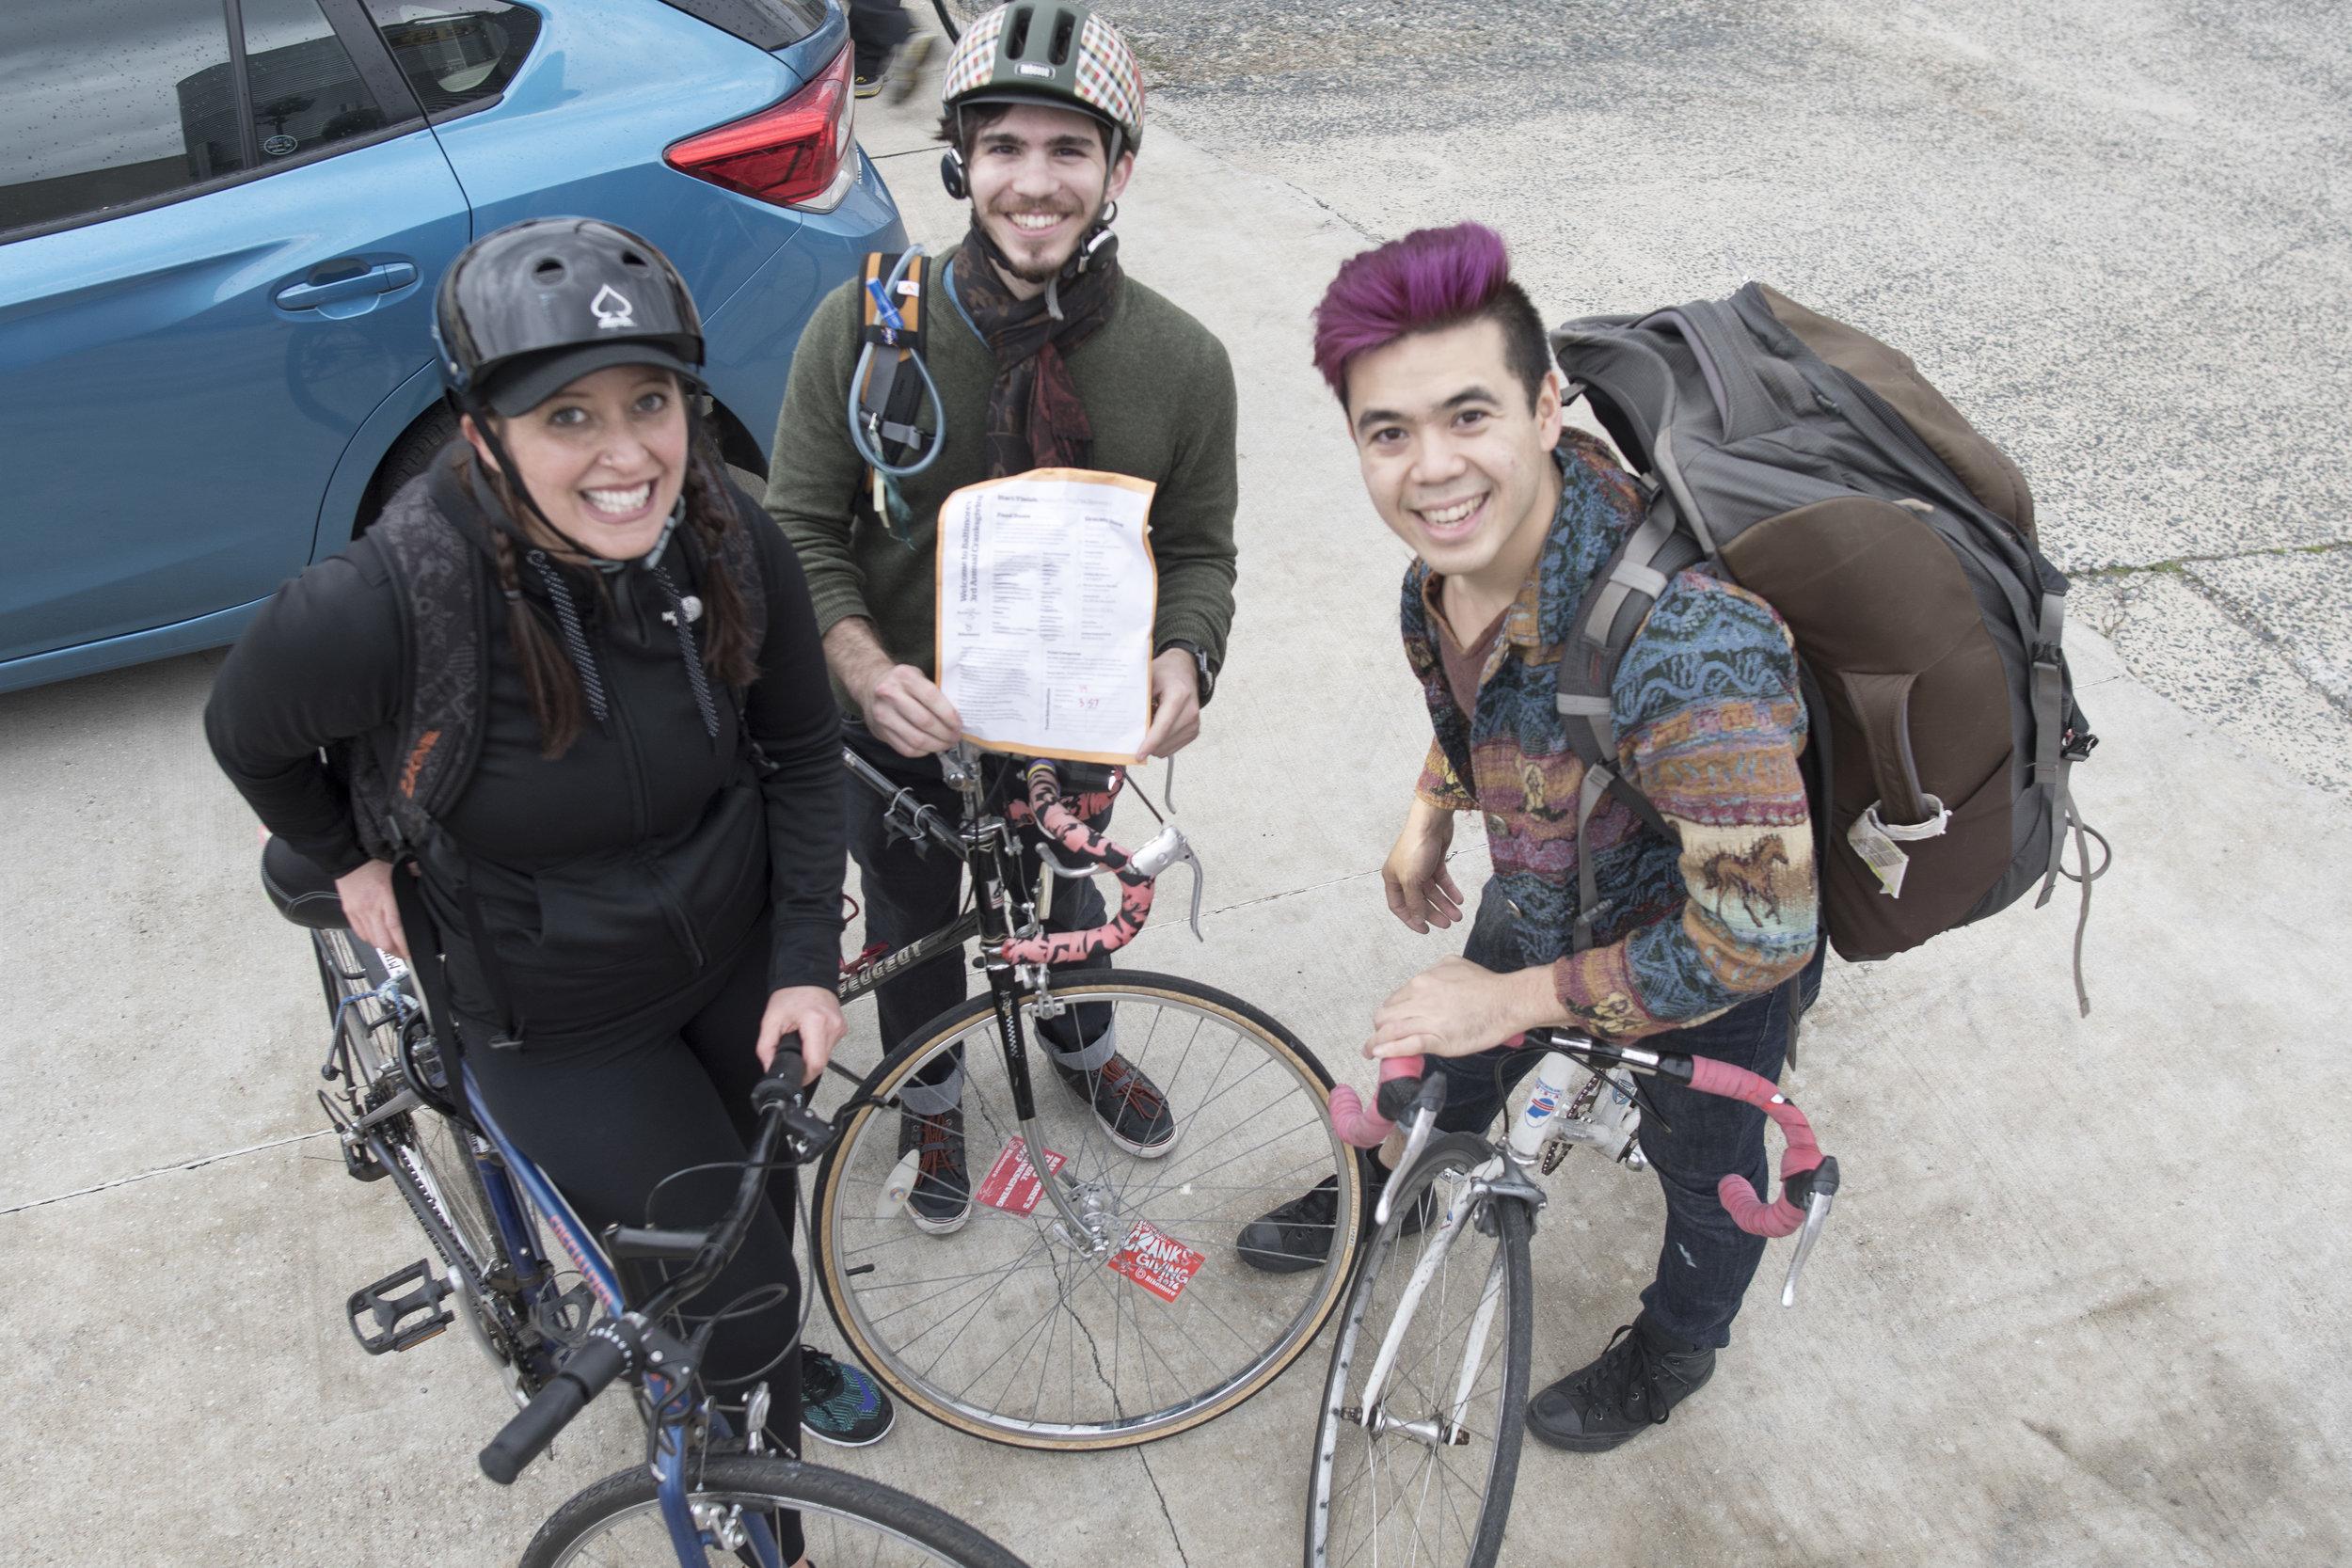 Cranksgiving_2017_bikemore (492).jpg